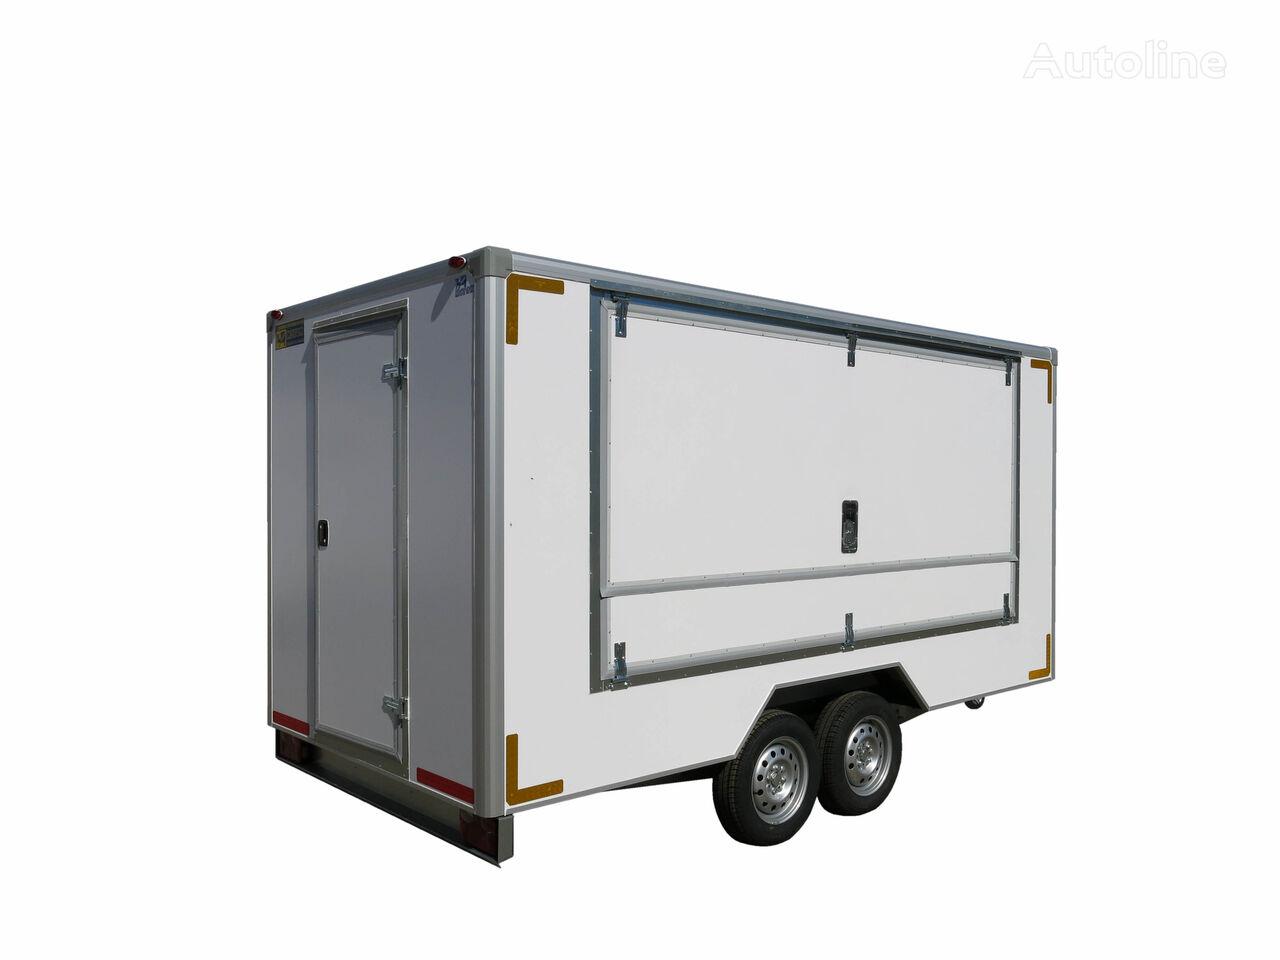 new ISTOK 3793A2 vending trailer